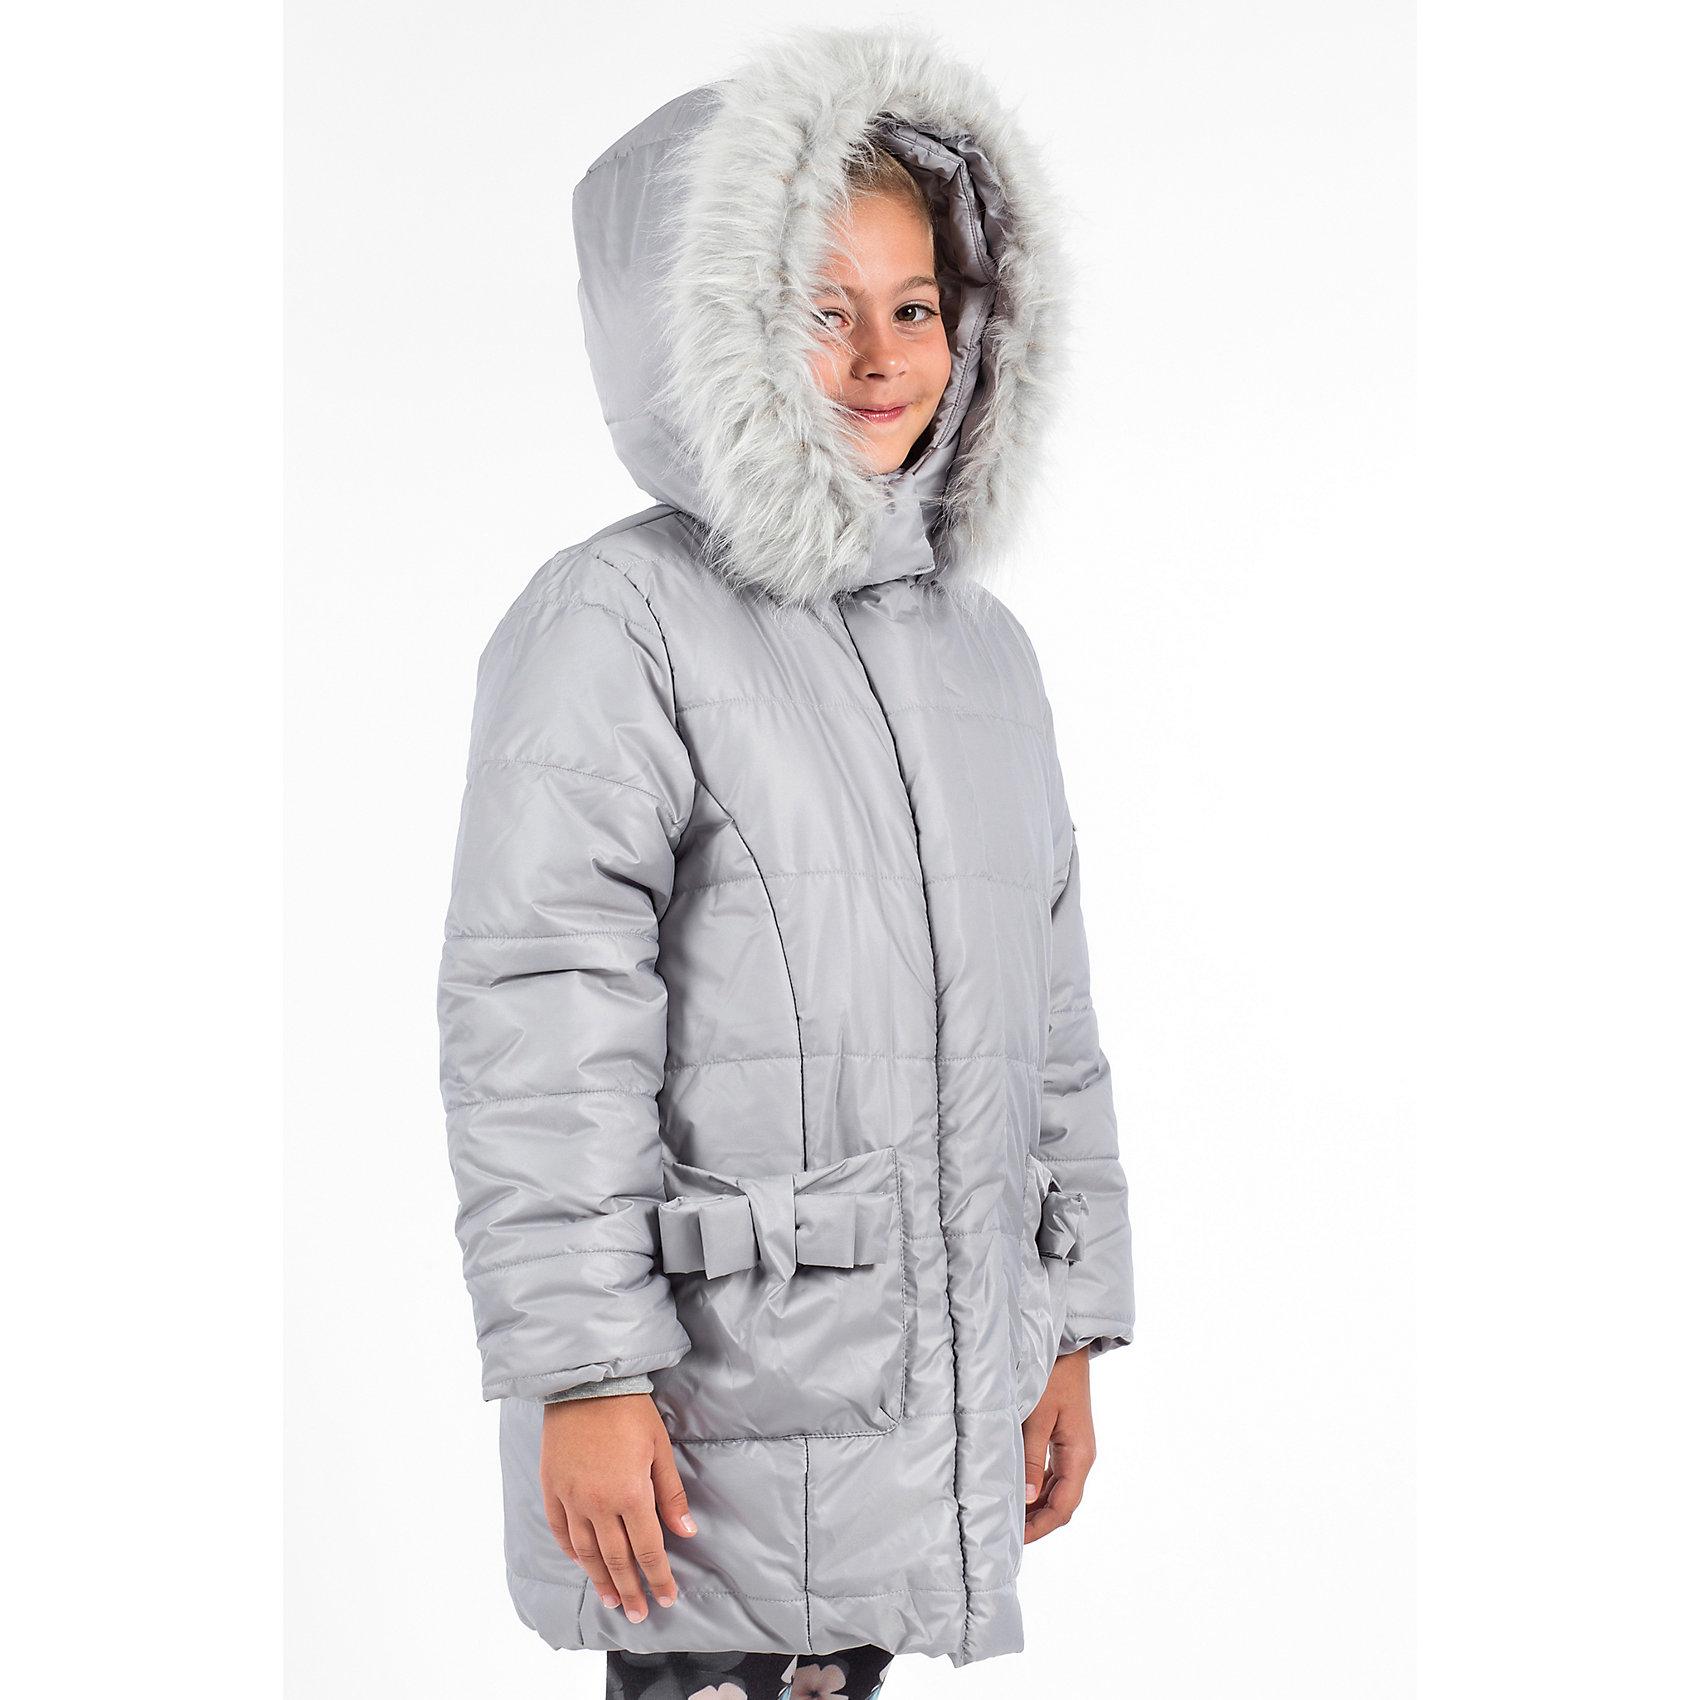 Куртка утепленная для девочки WojcikВерхняя одежда<br>Куртка утепленная для девочки Wojcik<br>Состав:<br>Полиэстер 100%<br><br>Ширина мм: 356<br>Глубина мм: 10<br>Высота мм: 245<br>Вес г: 519<br>Цвет: серый<br>Возраст от месяцев: 120<br>Возраст до месяцев: 132<br>Пол: Женский<br>Возраст: Детский<br>Размер: 146,104,110,116,122,128,140<br>SKU: 5591239